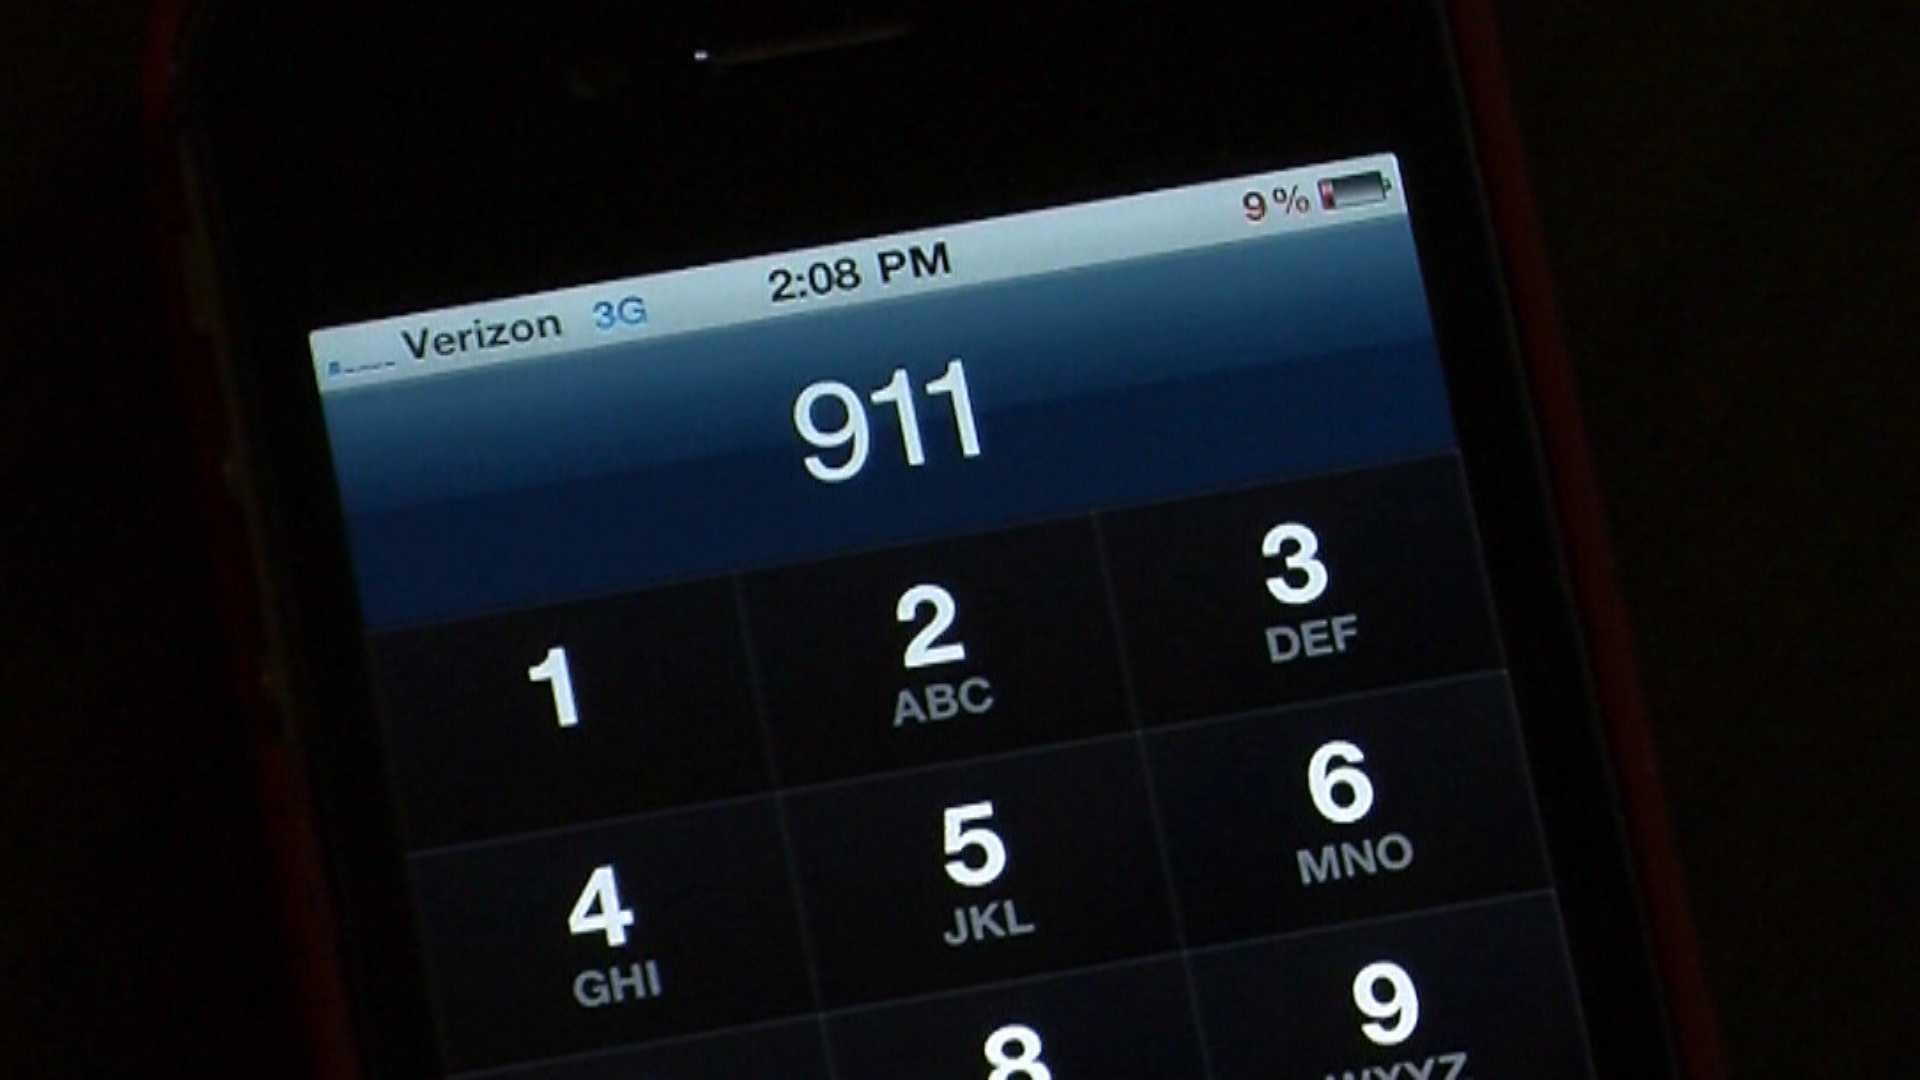 911 thetford